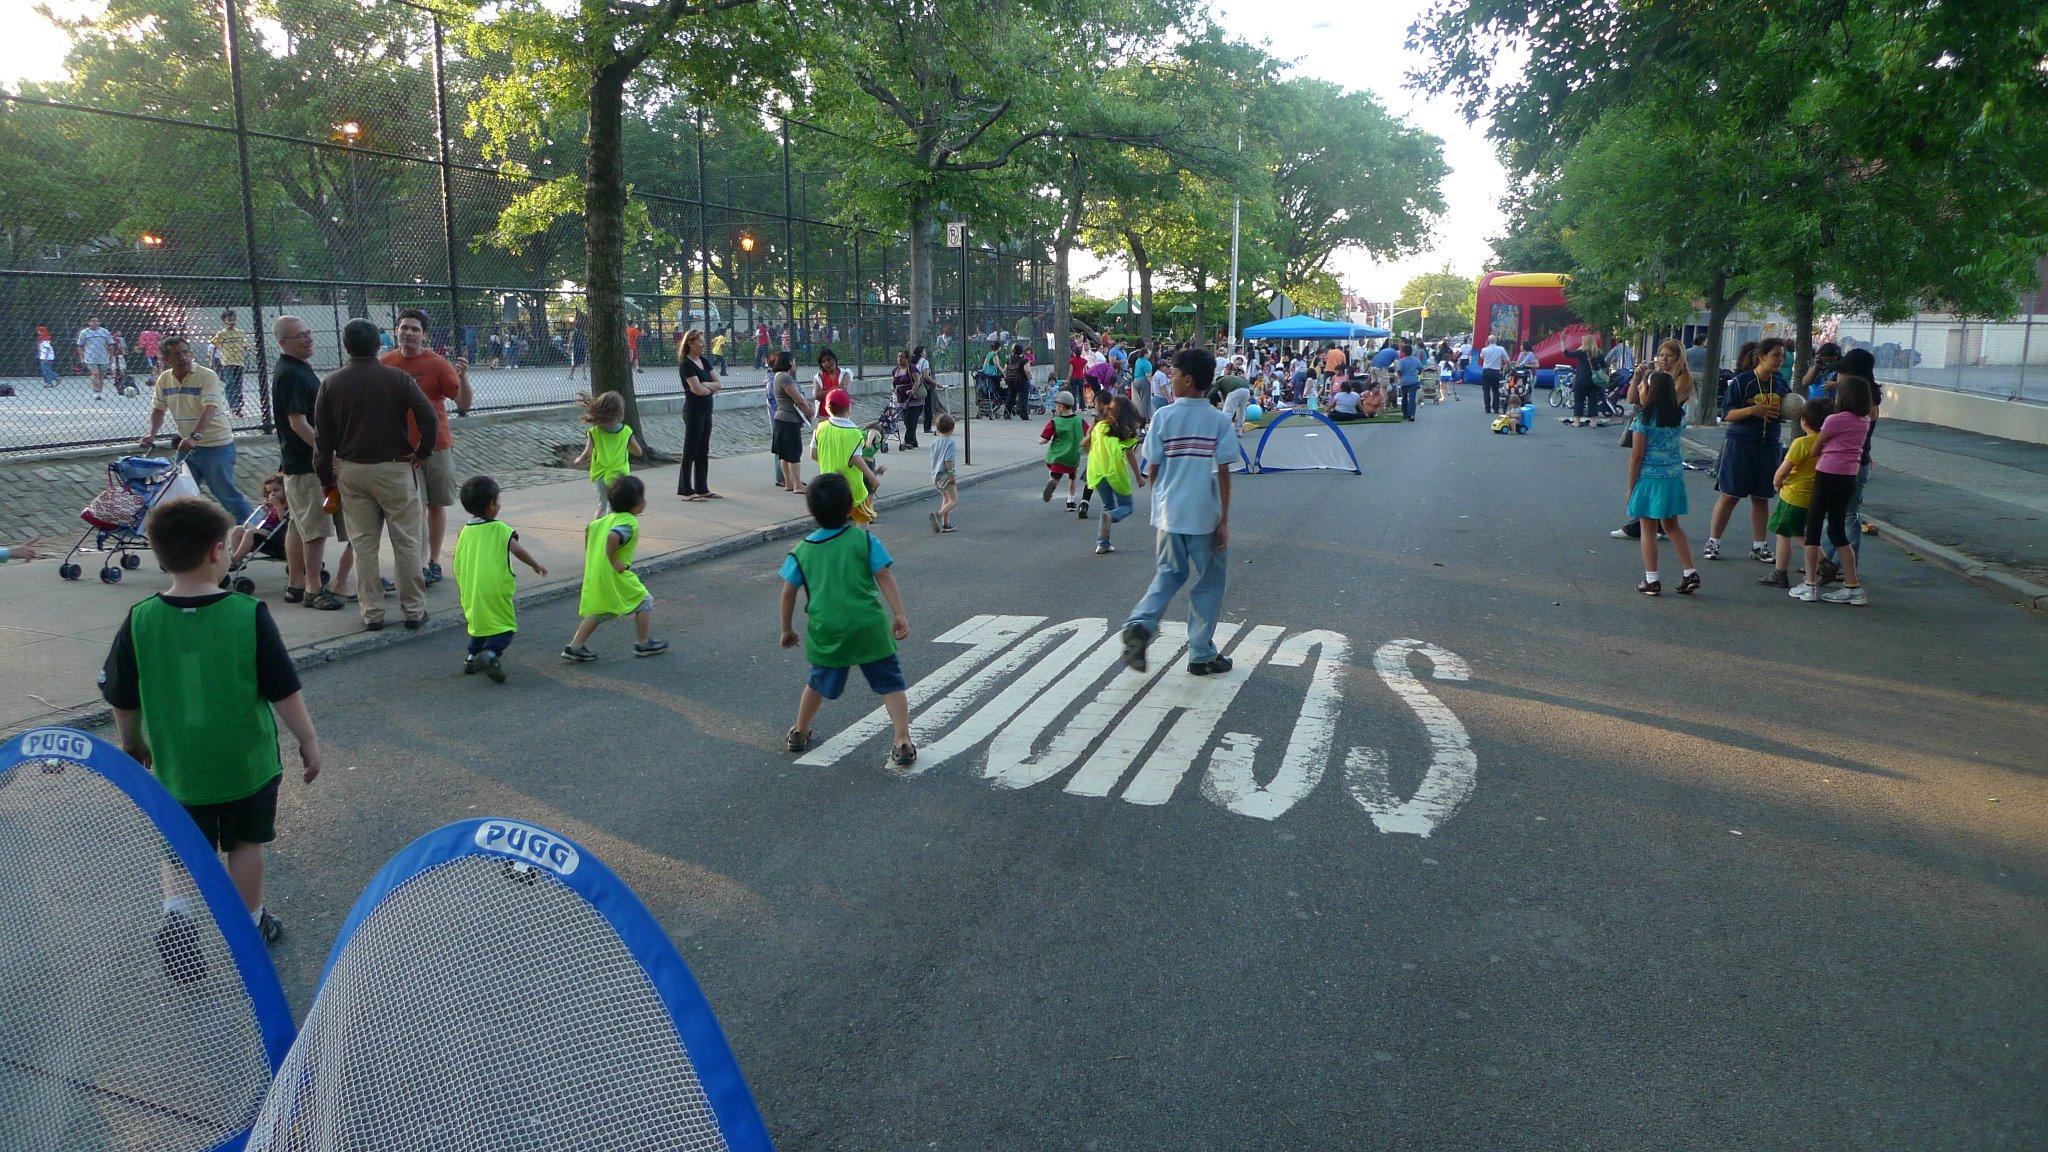 78th Street Play Street